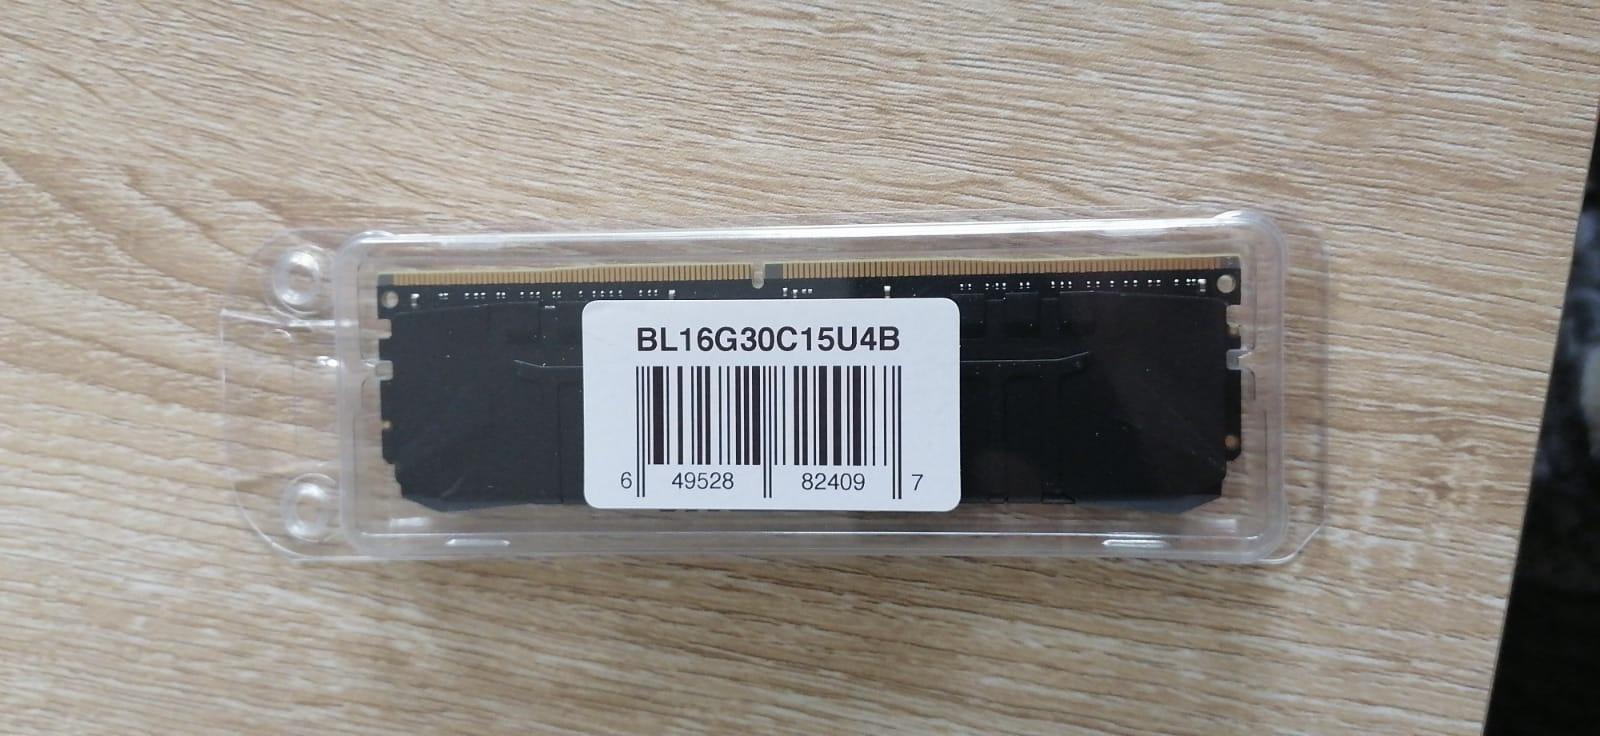 F2794C2E-B2E4-4408-BF2B-8EC392DEE923.jpeg